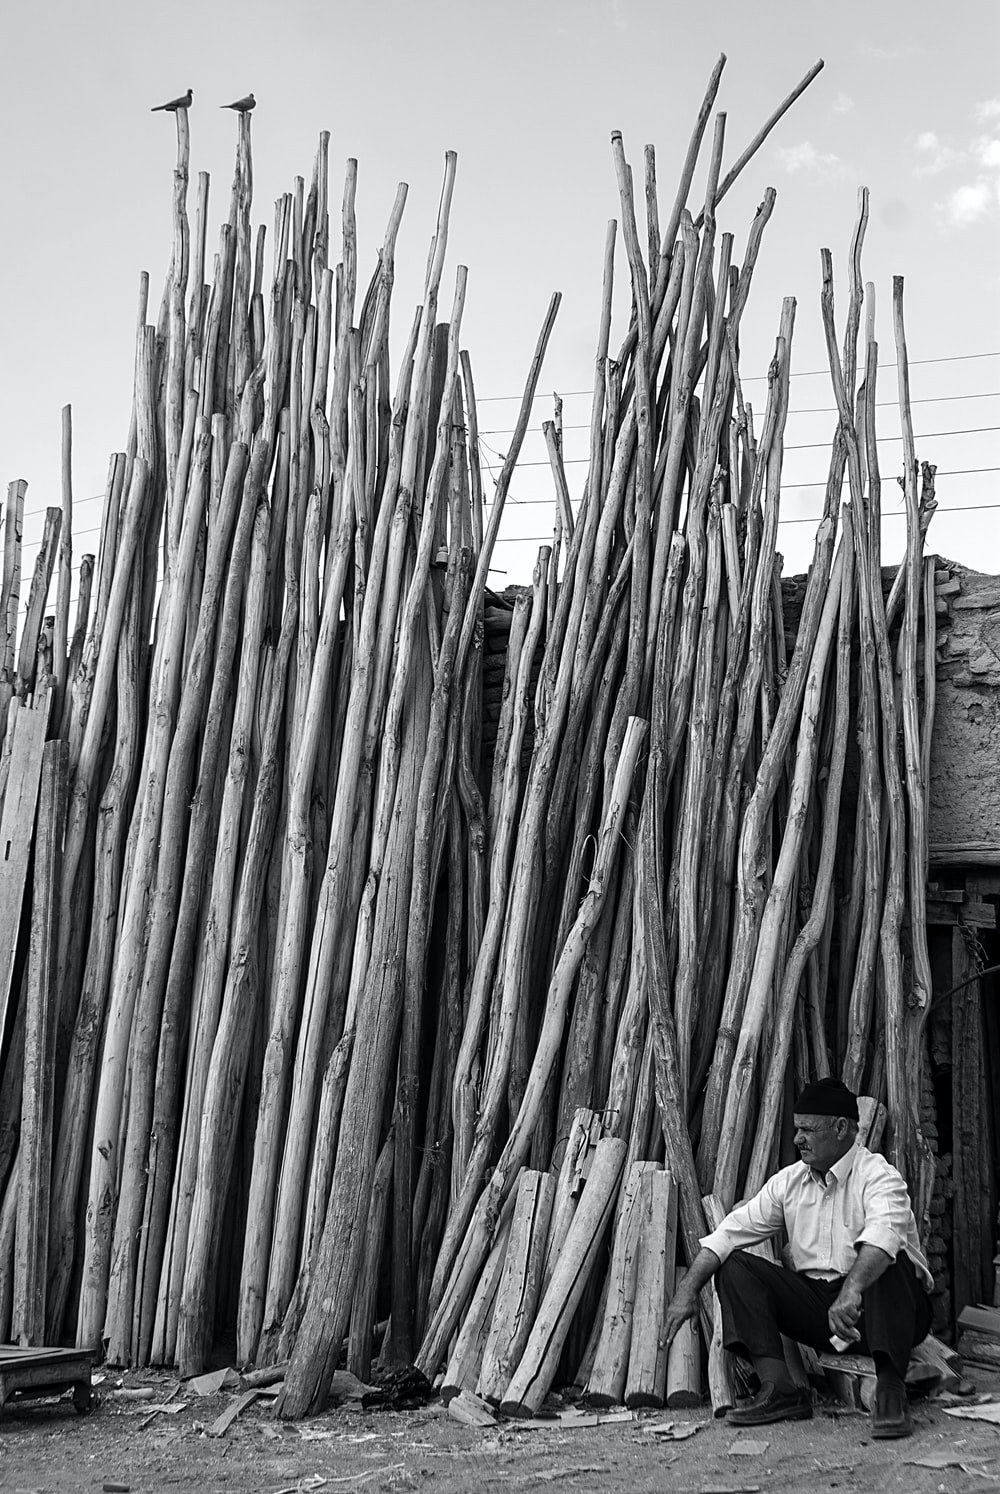 man sitting near the stick